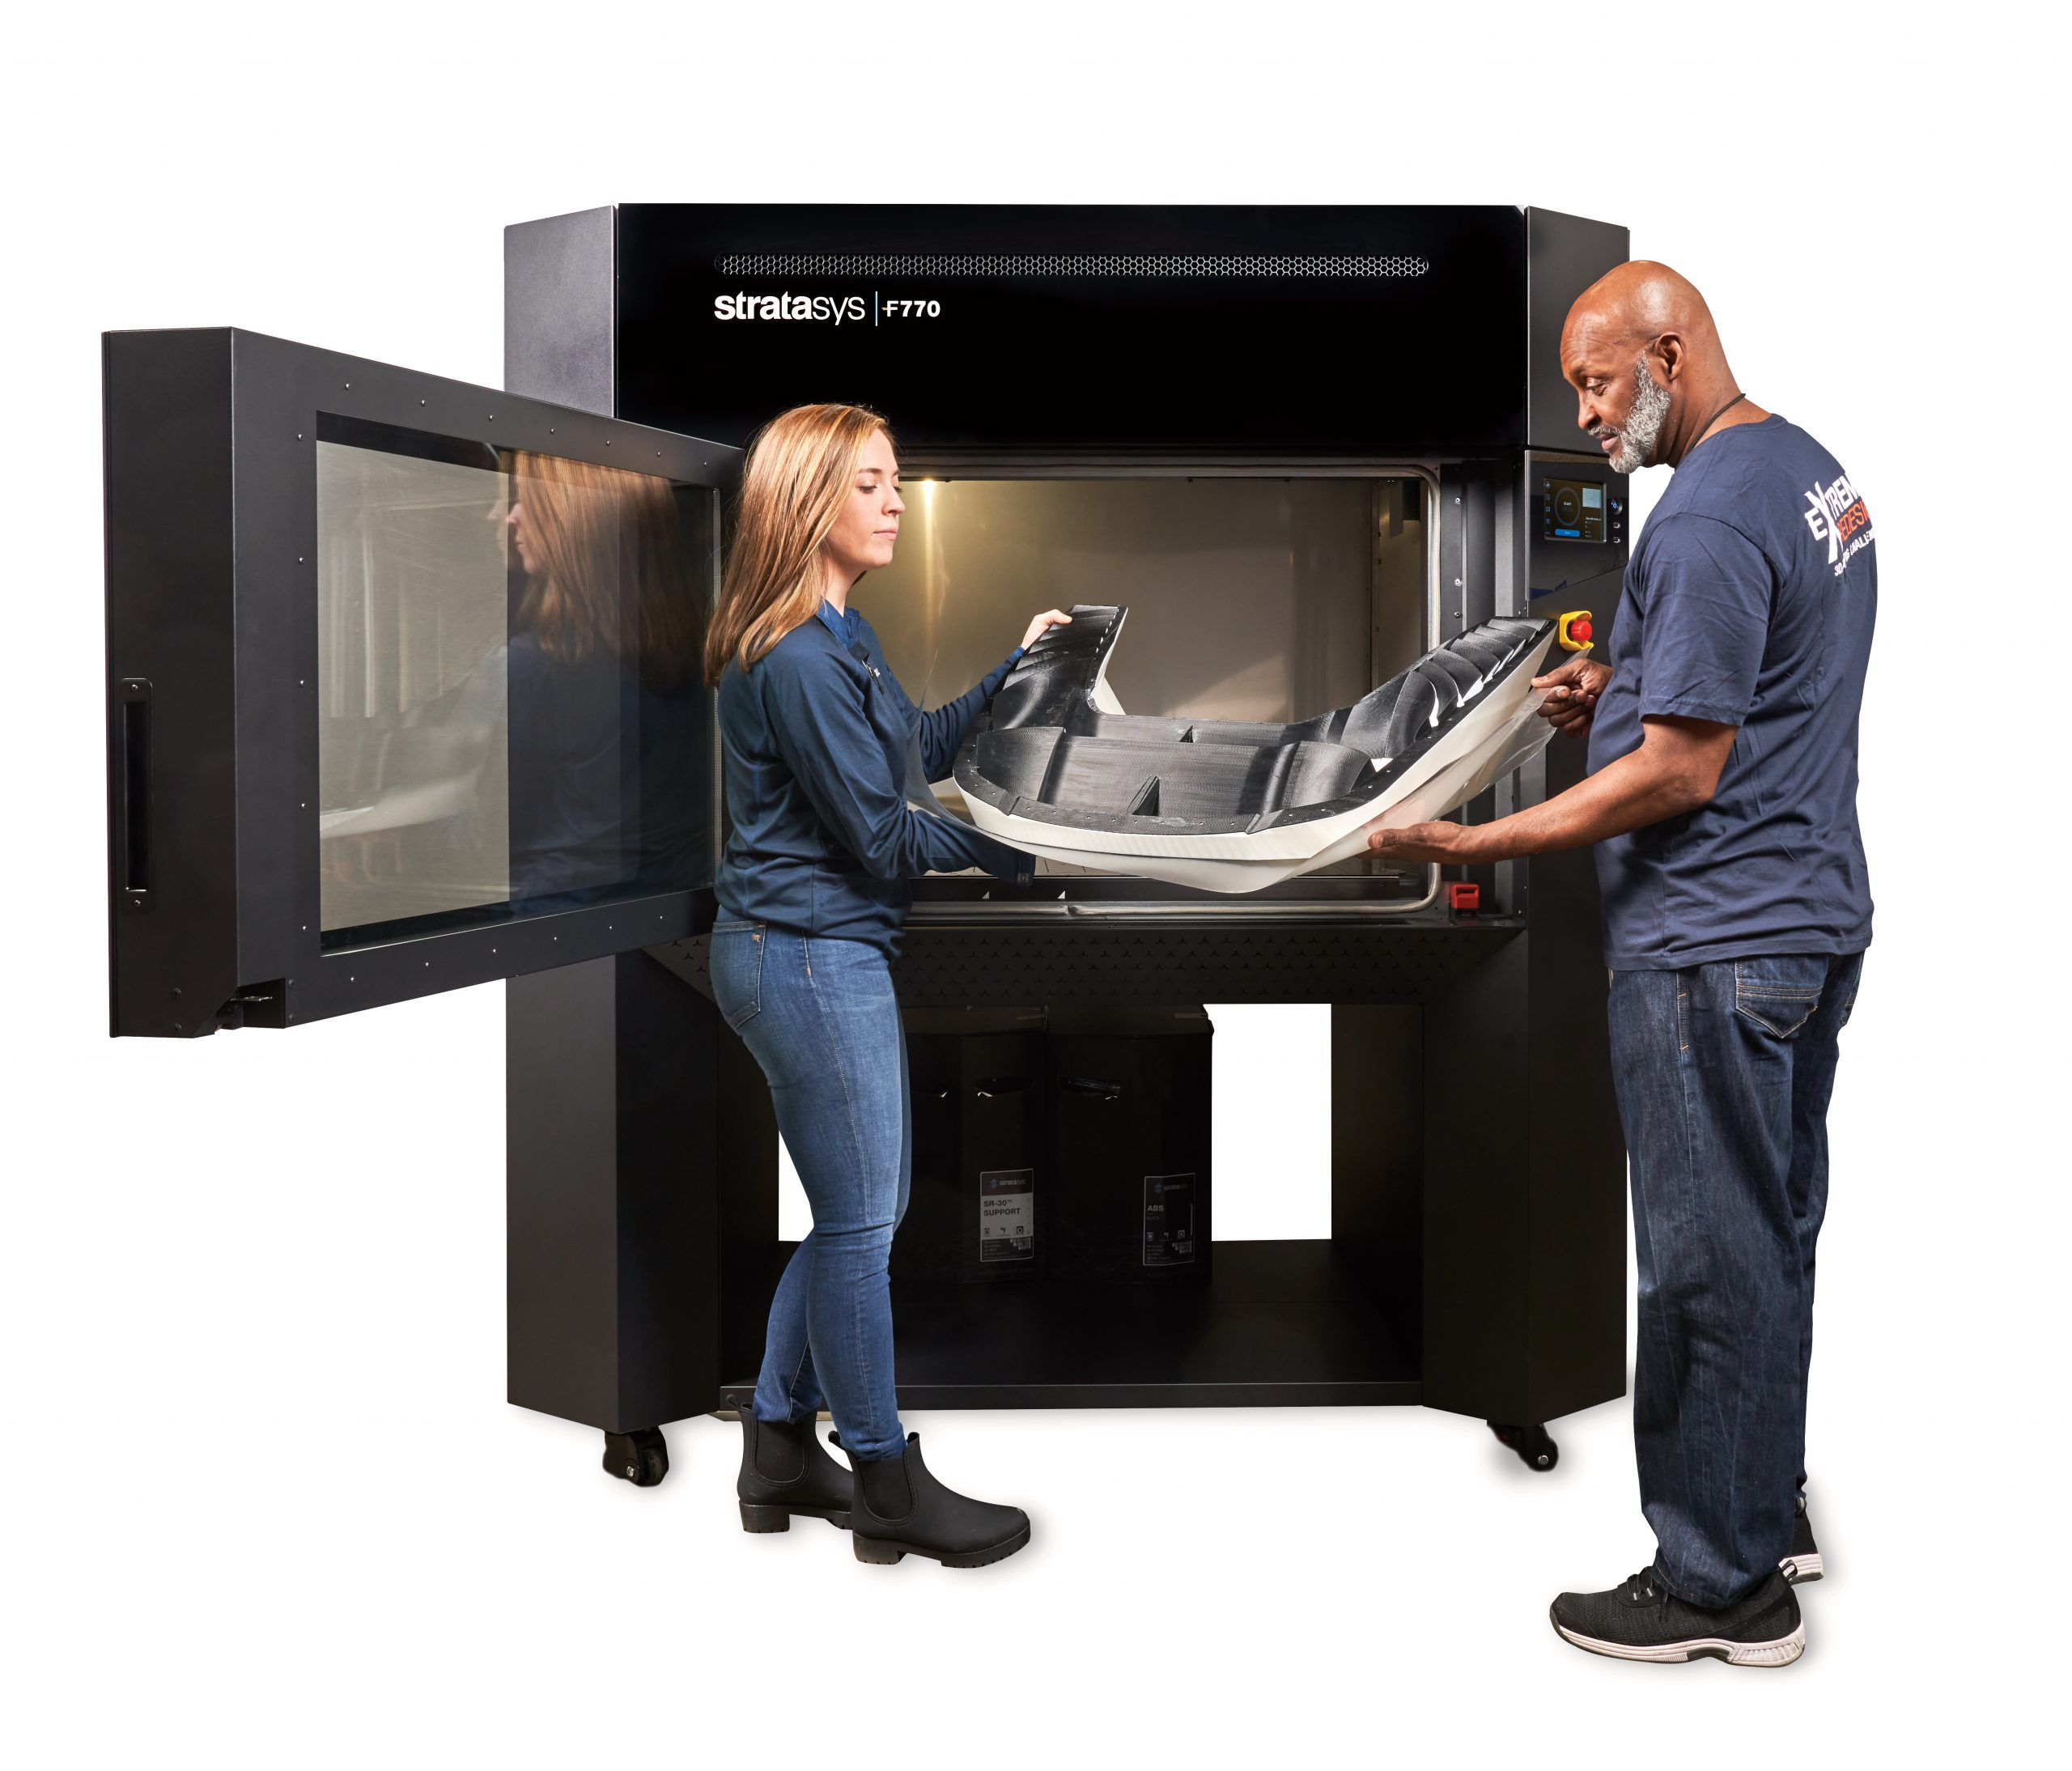 Stratasys F770 FDM 3D printer. Photo via Stratasys.